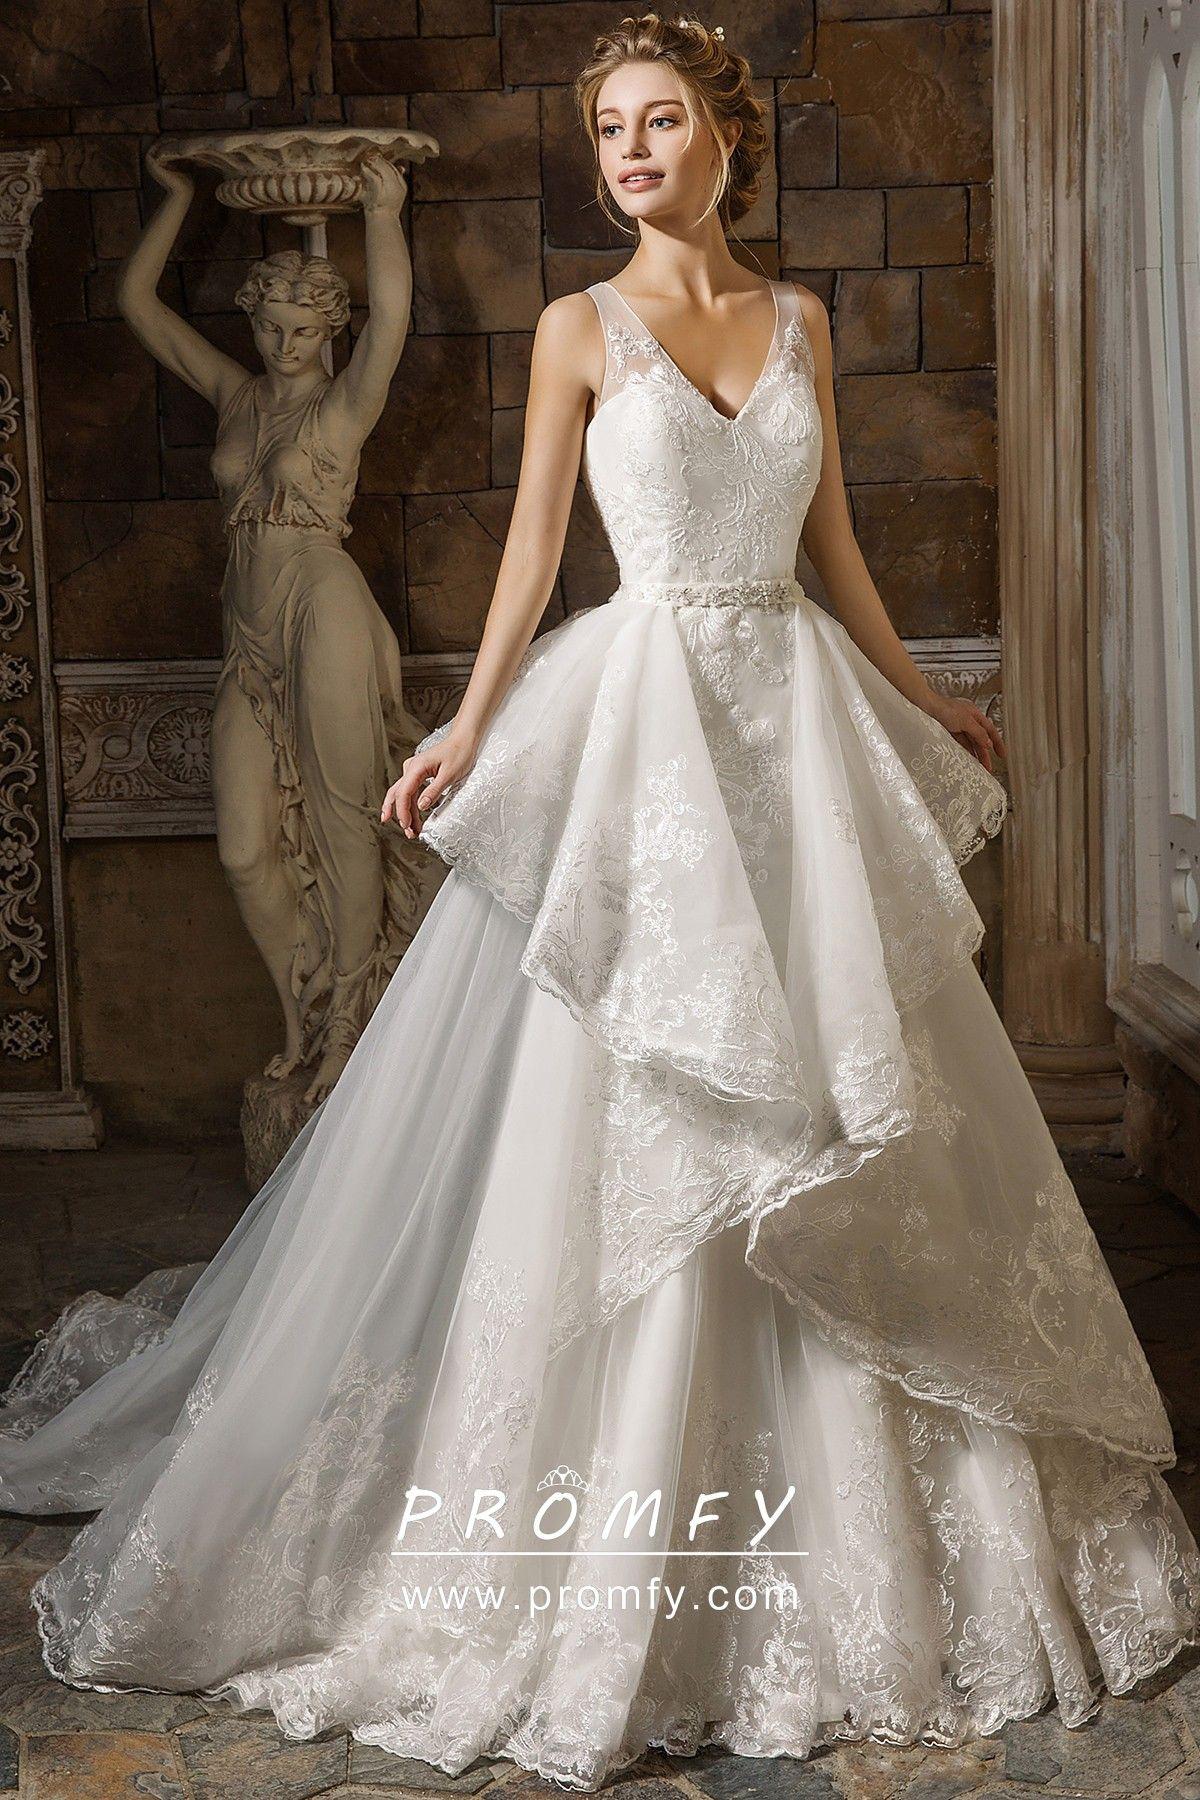 Asymmetrical Overskirt V Neck Mermaid Wedding Dress Detachable Train Wedding Dress Wedding Gowns Mermaid Wedding Dress Train [ 1800 x 1200 Pixel ]